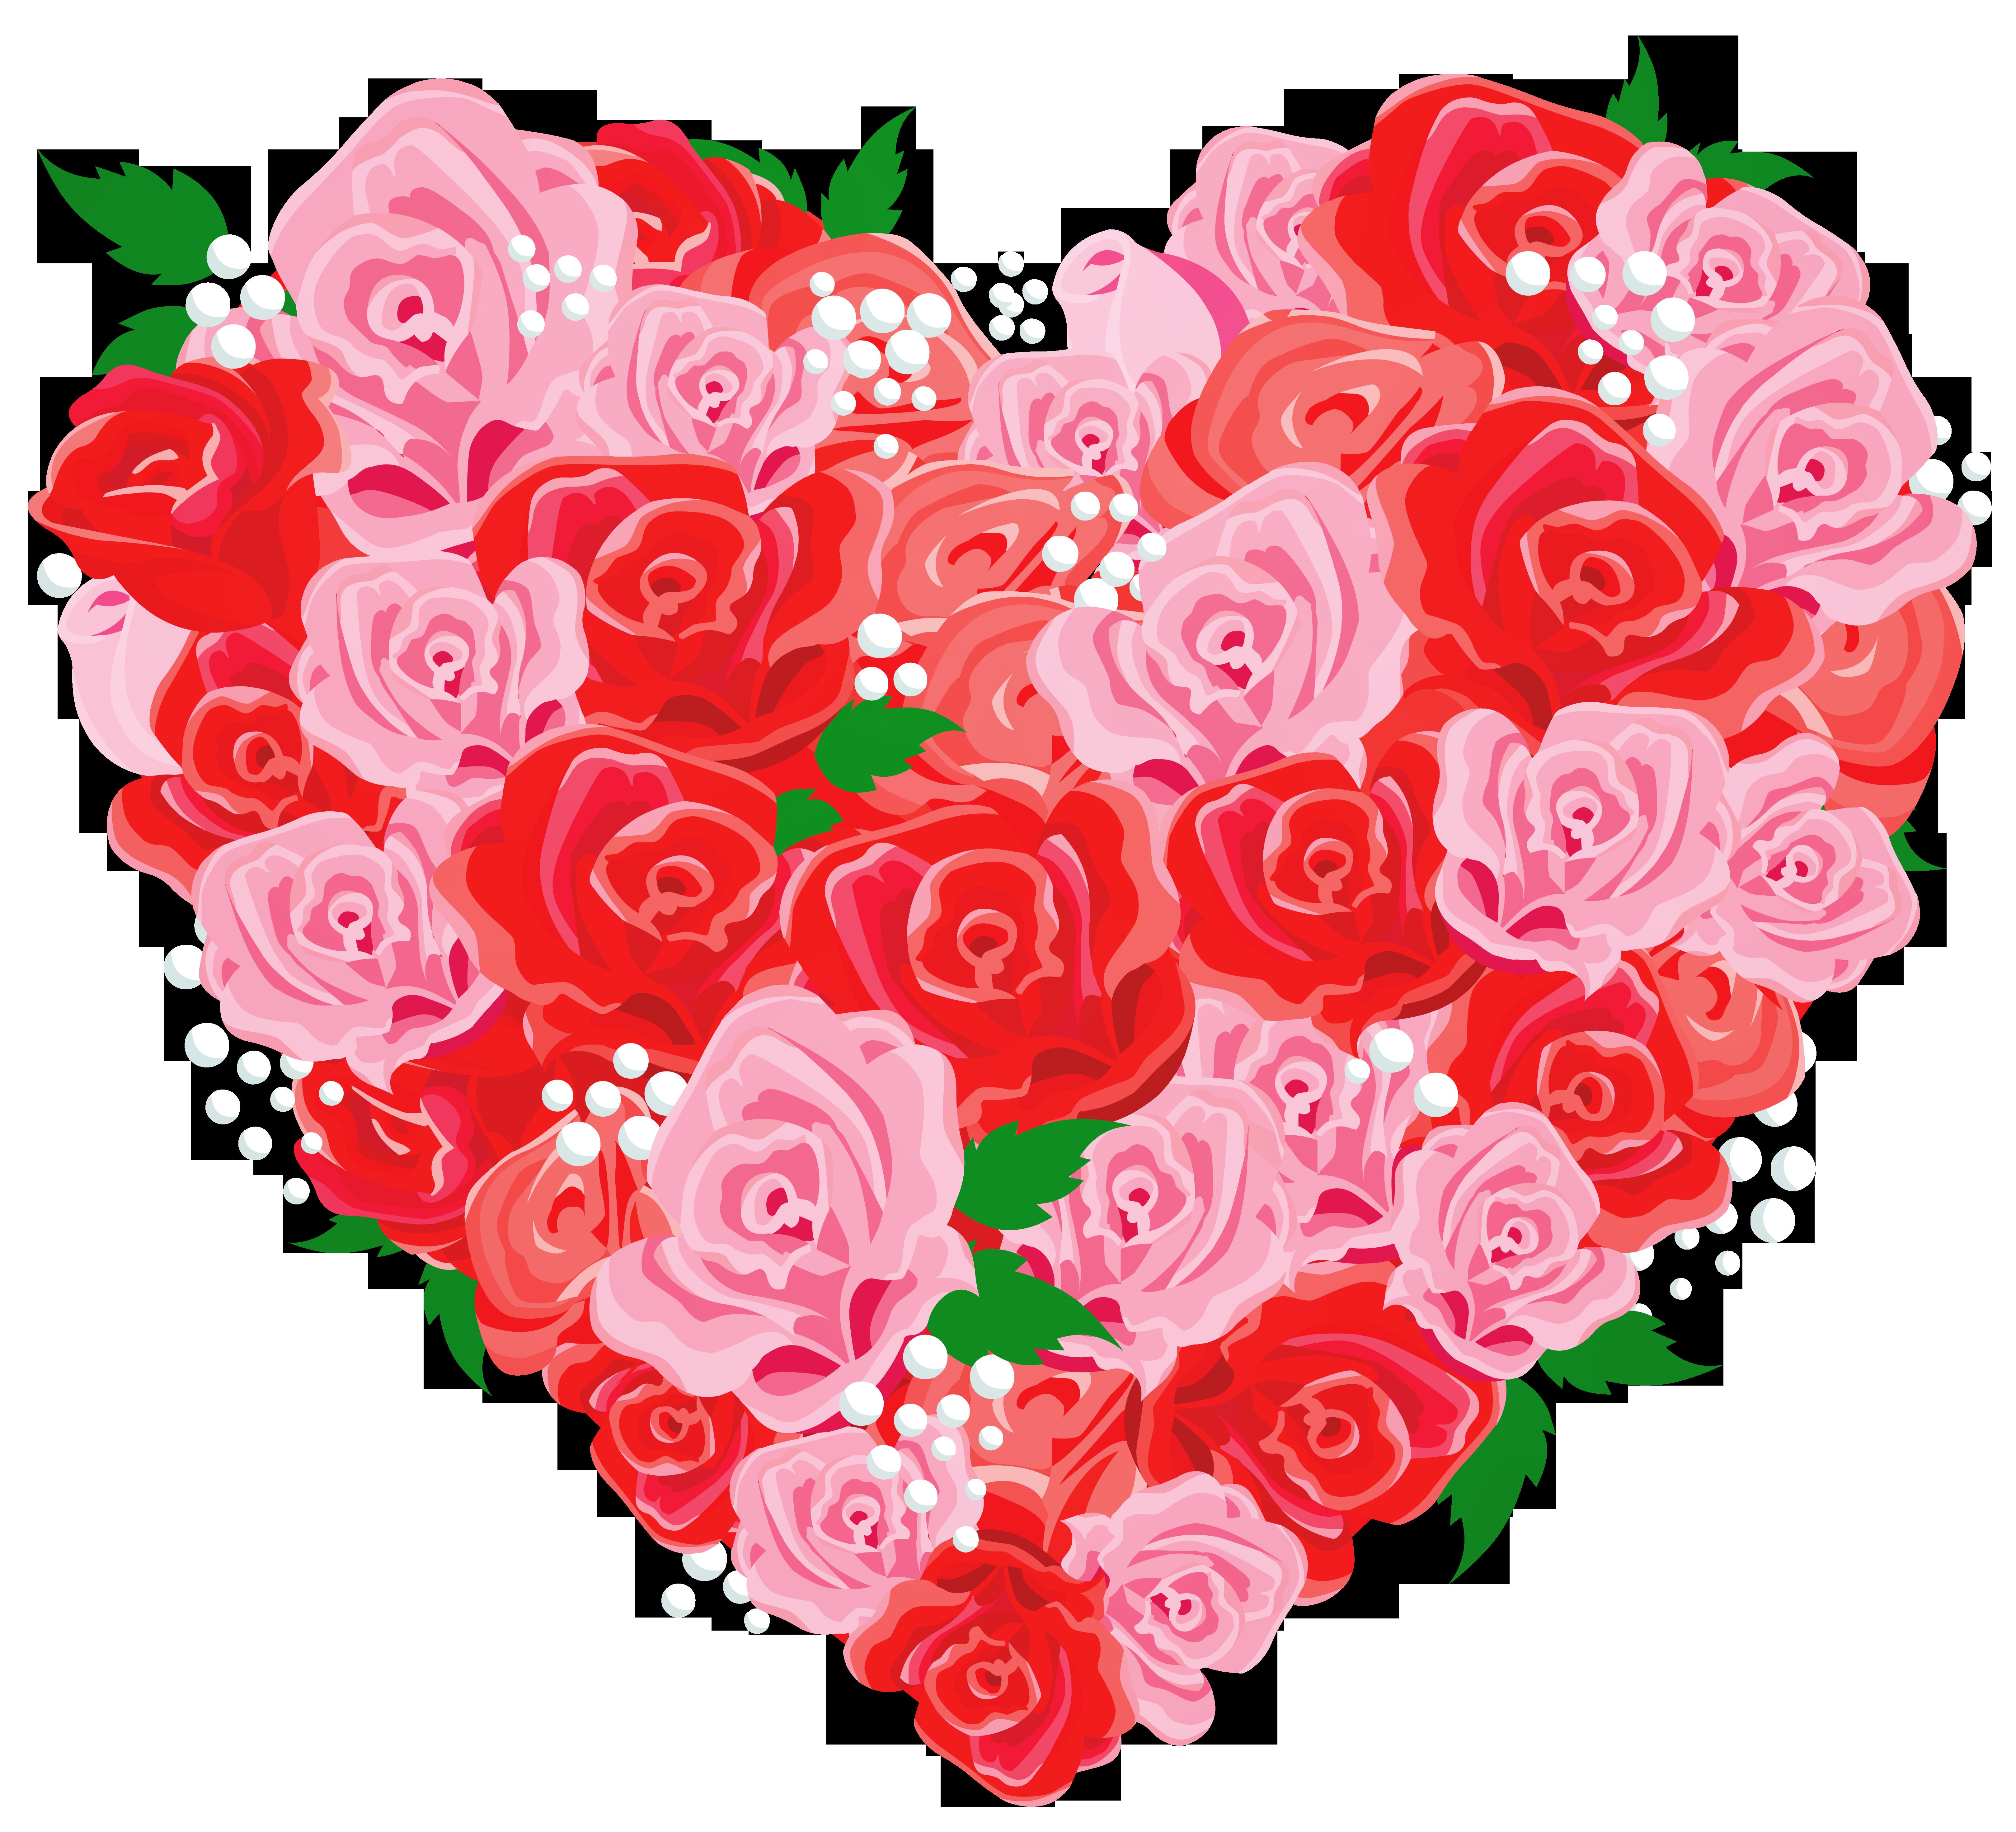 Deco rose heart.